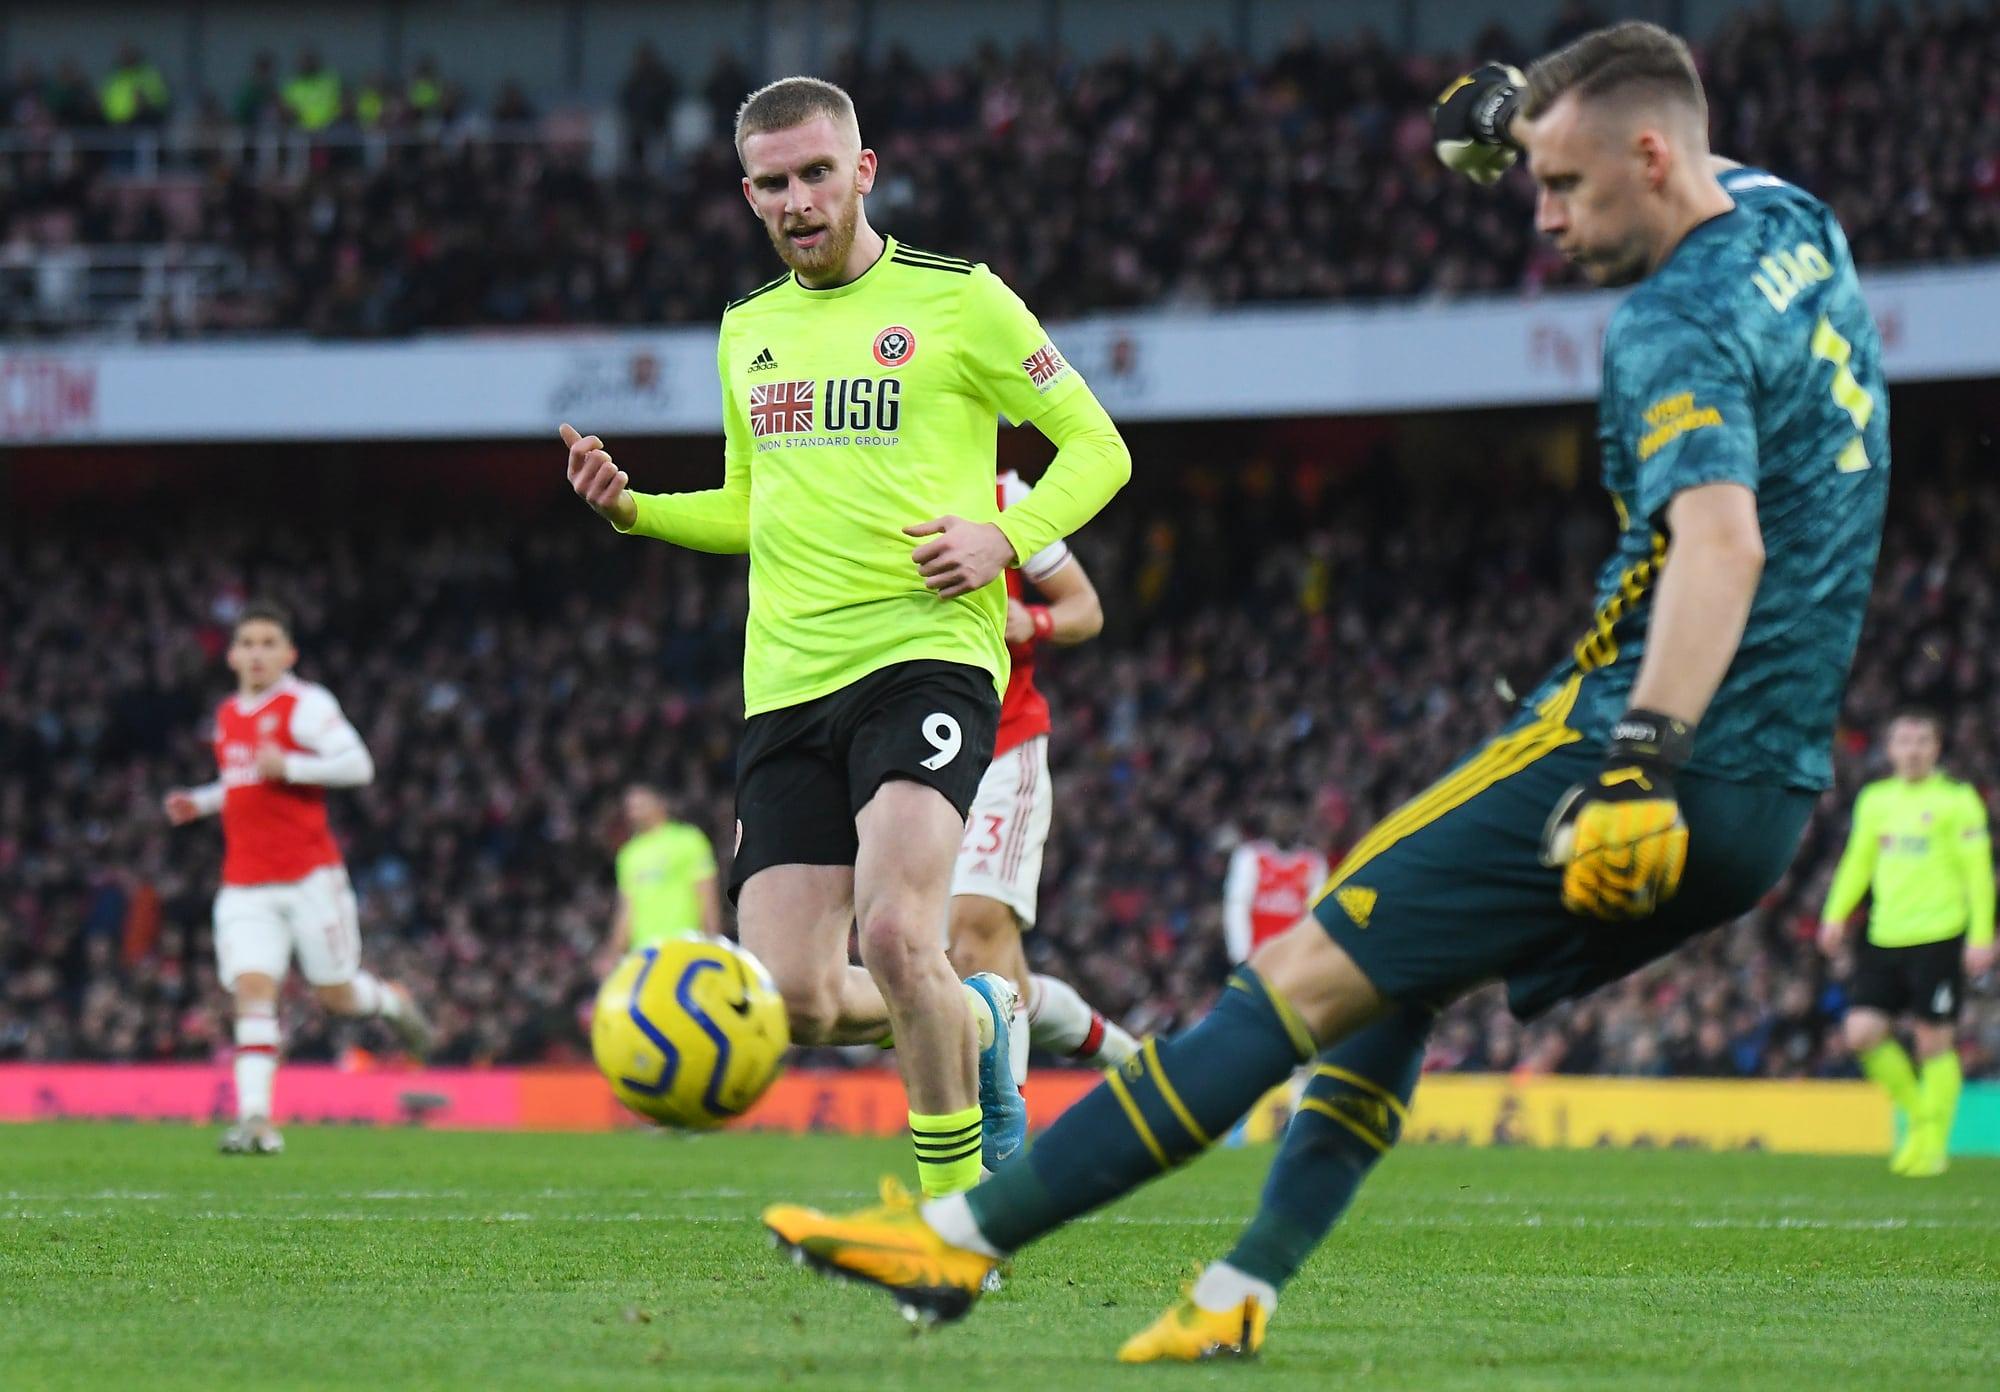 Oli McBurnie of Sheffield United faces Chelsea on Saturday